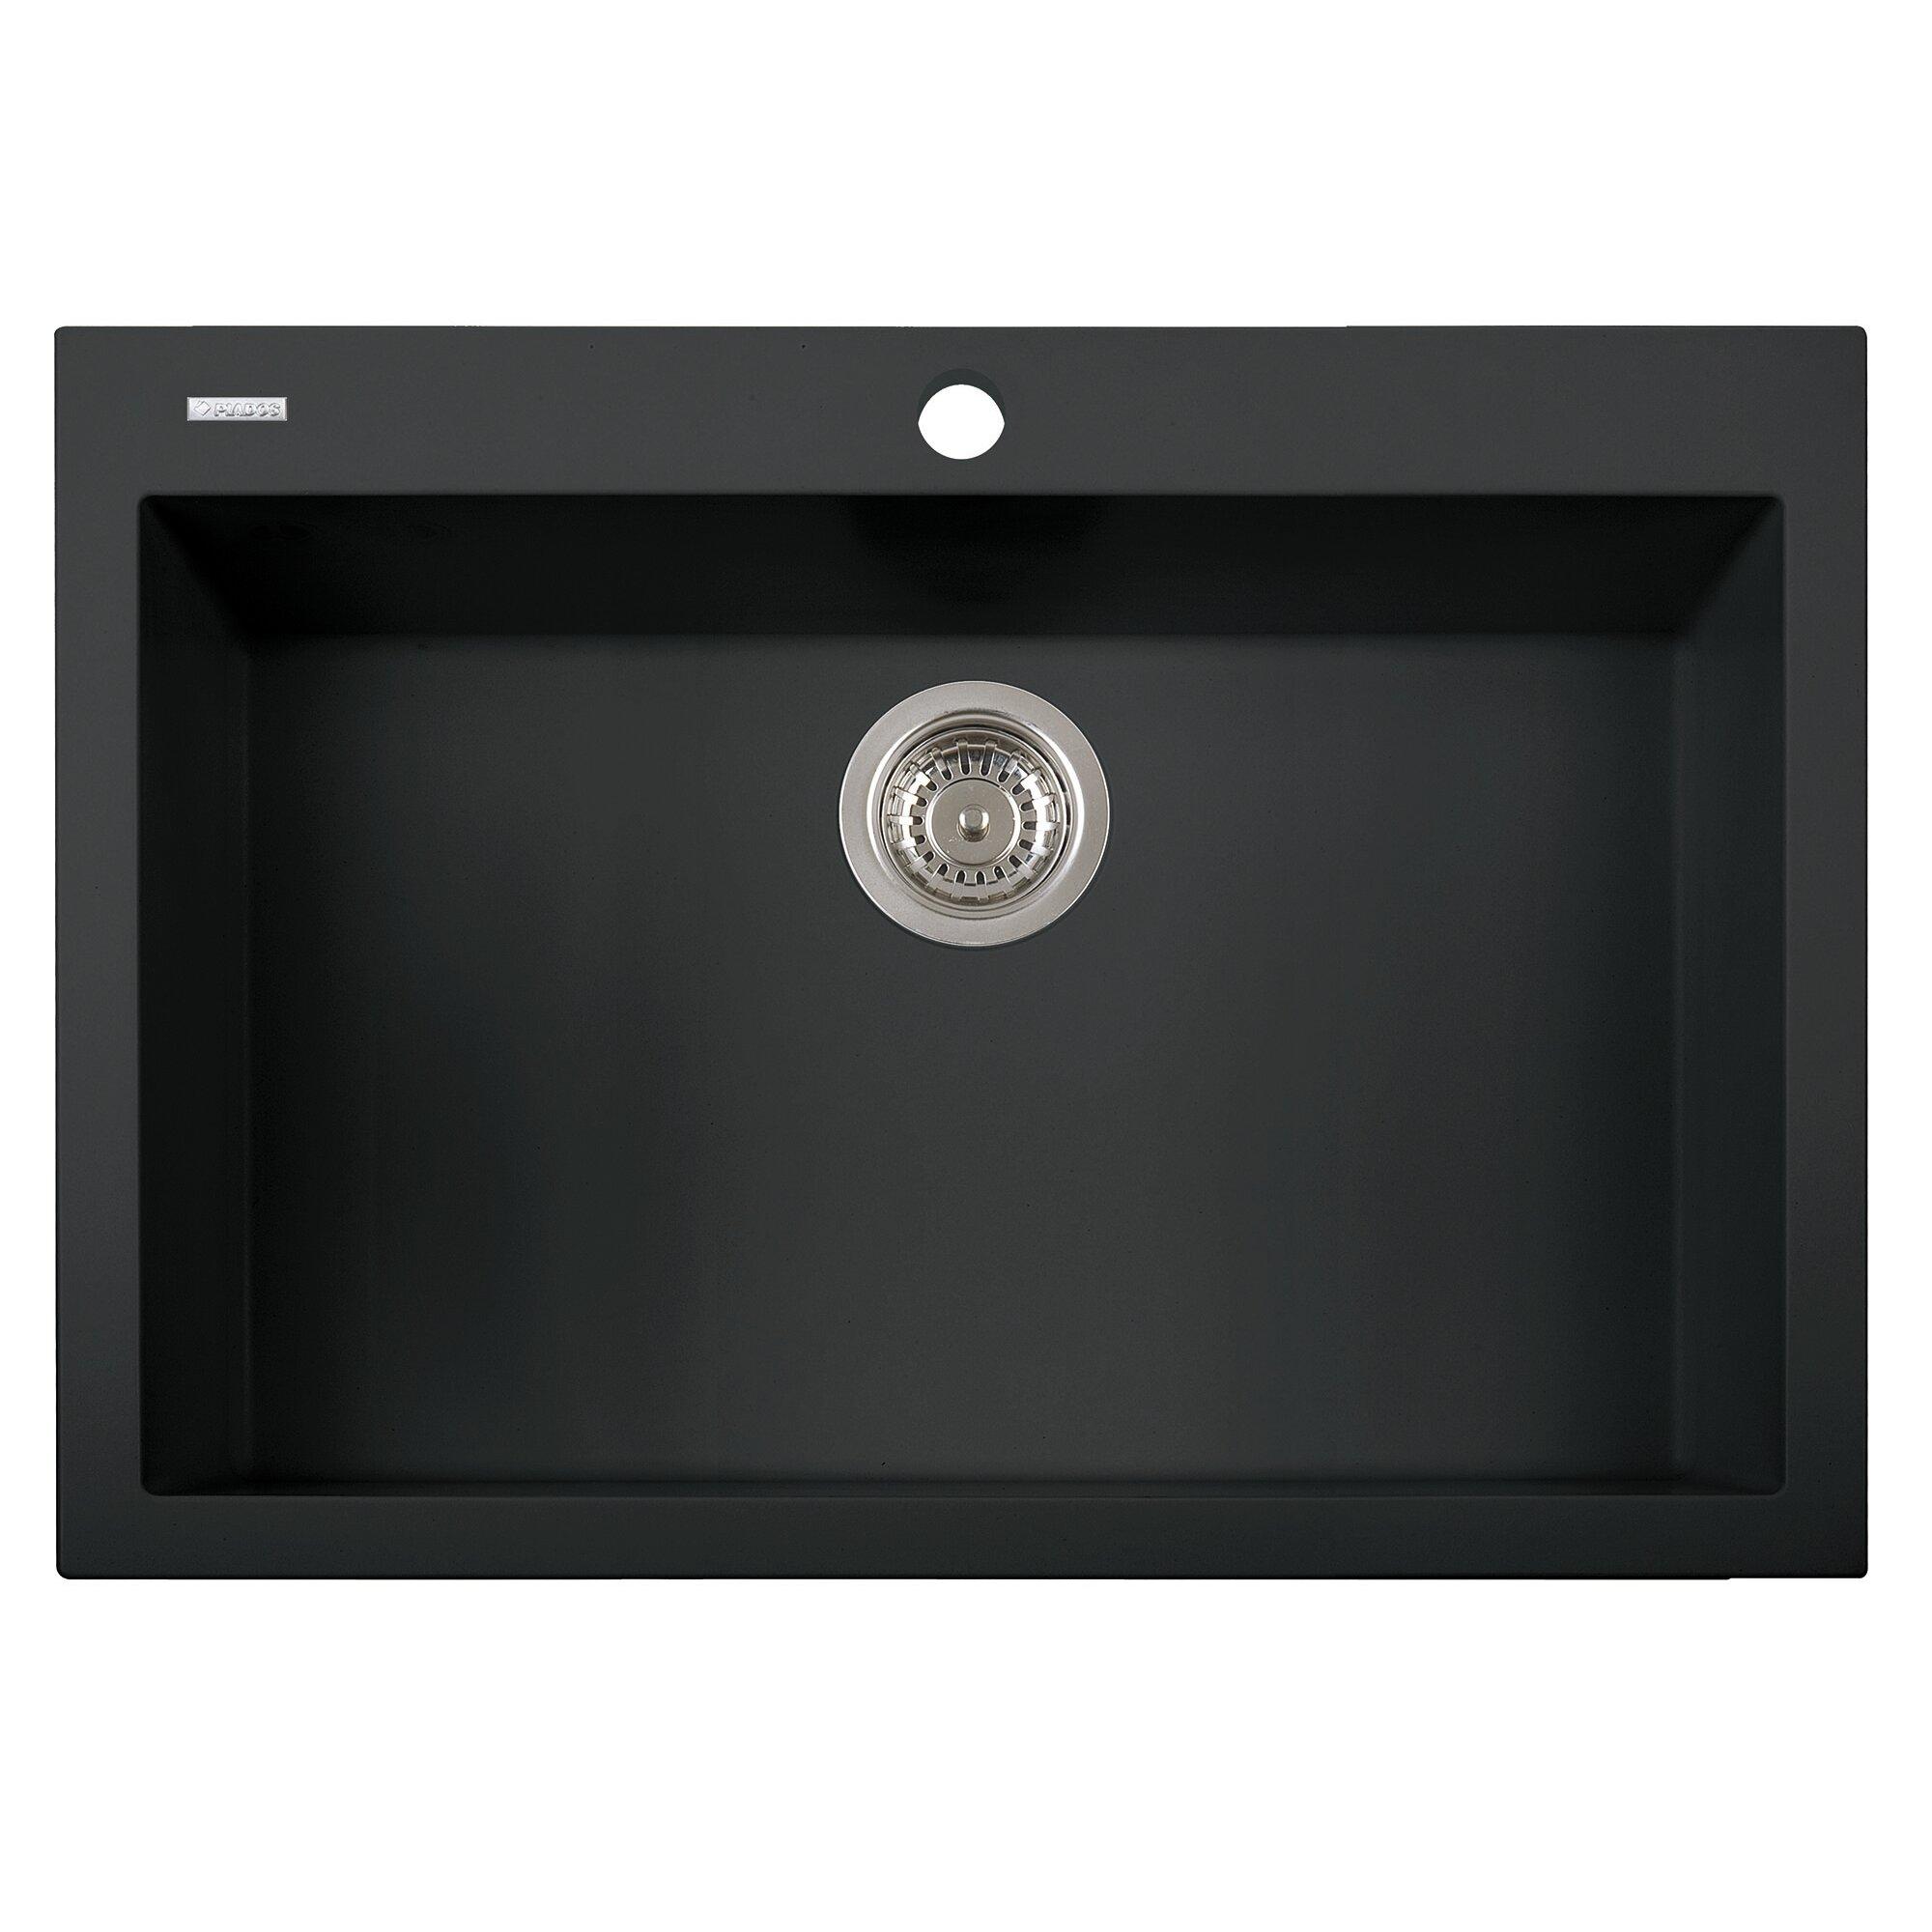 "Alfi Brand 30"" X 20"" Drop-In Single Bowl Kitchen Sink"